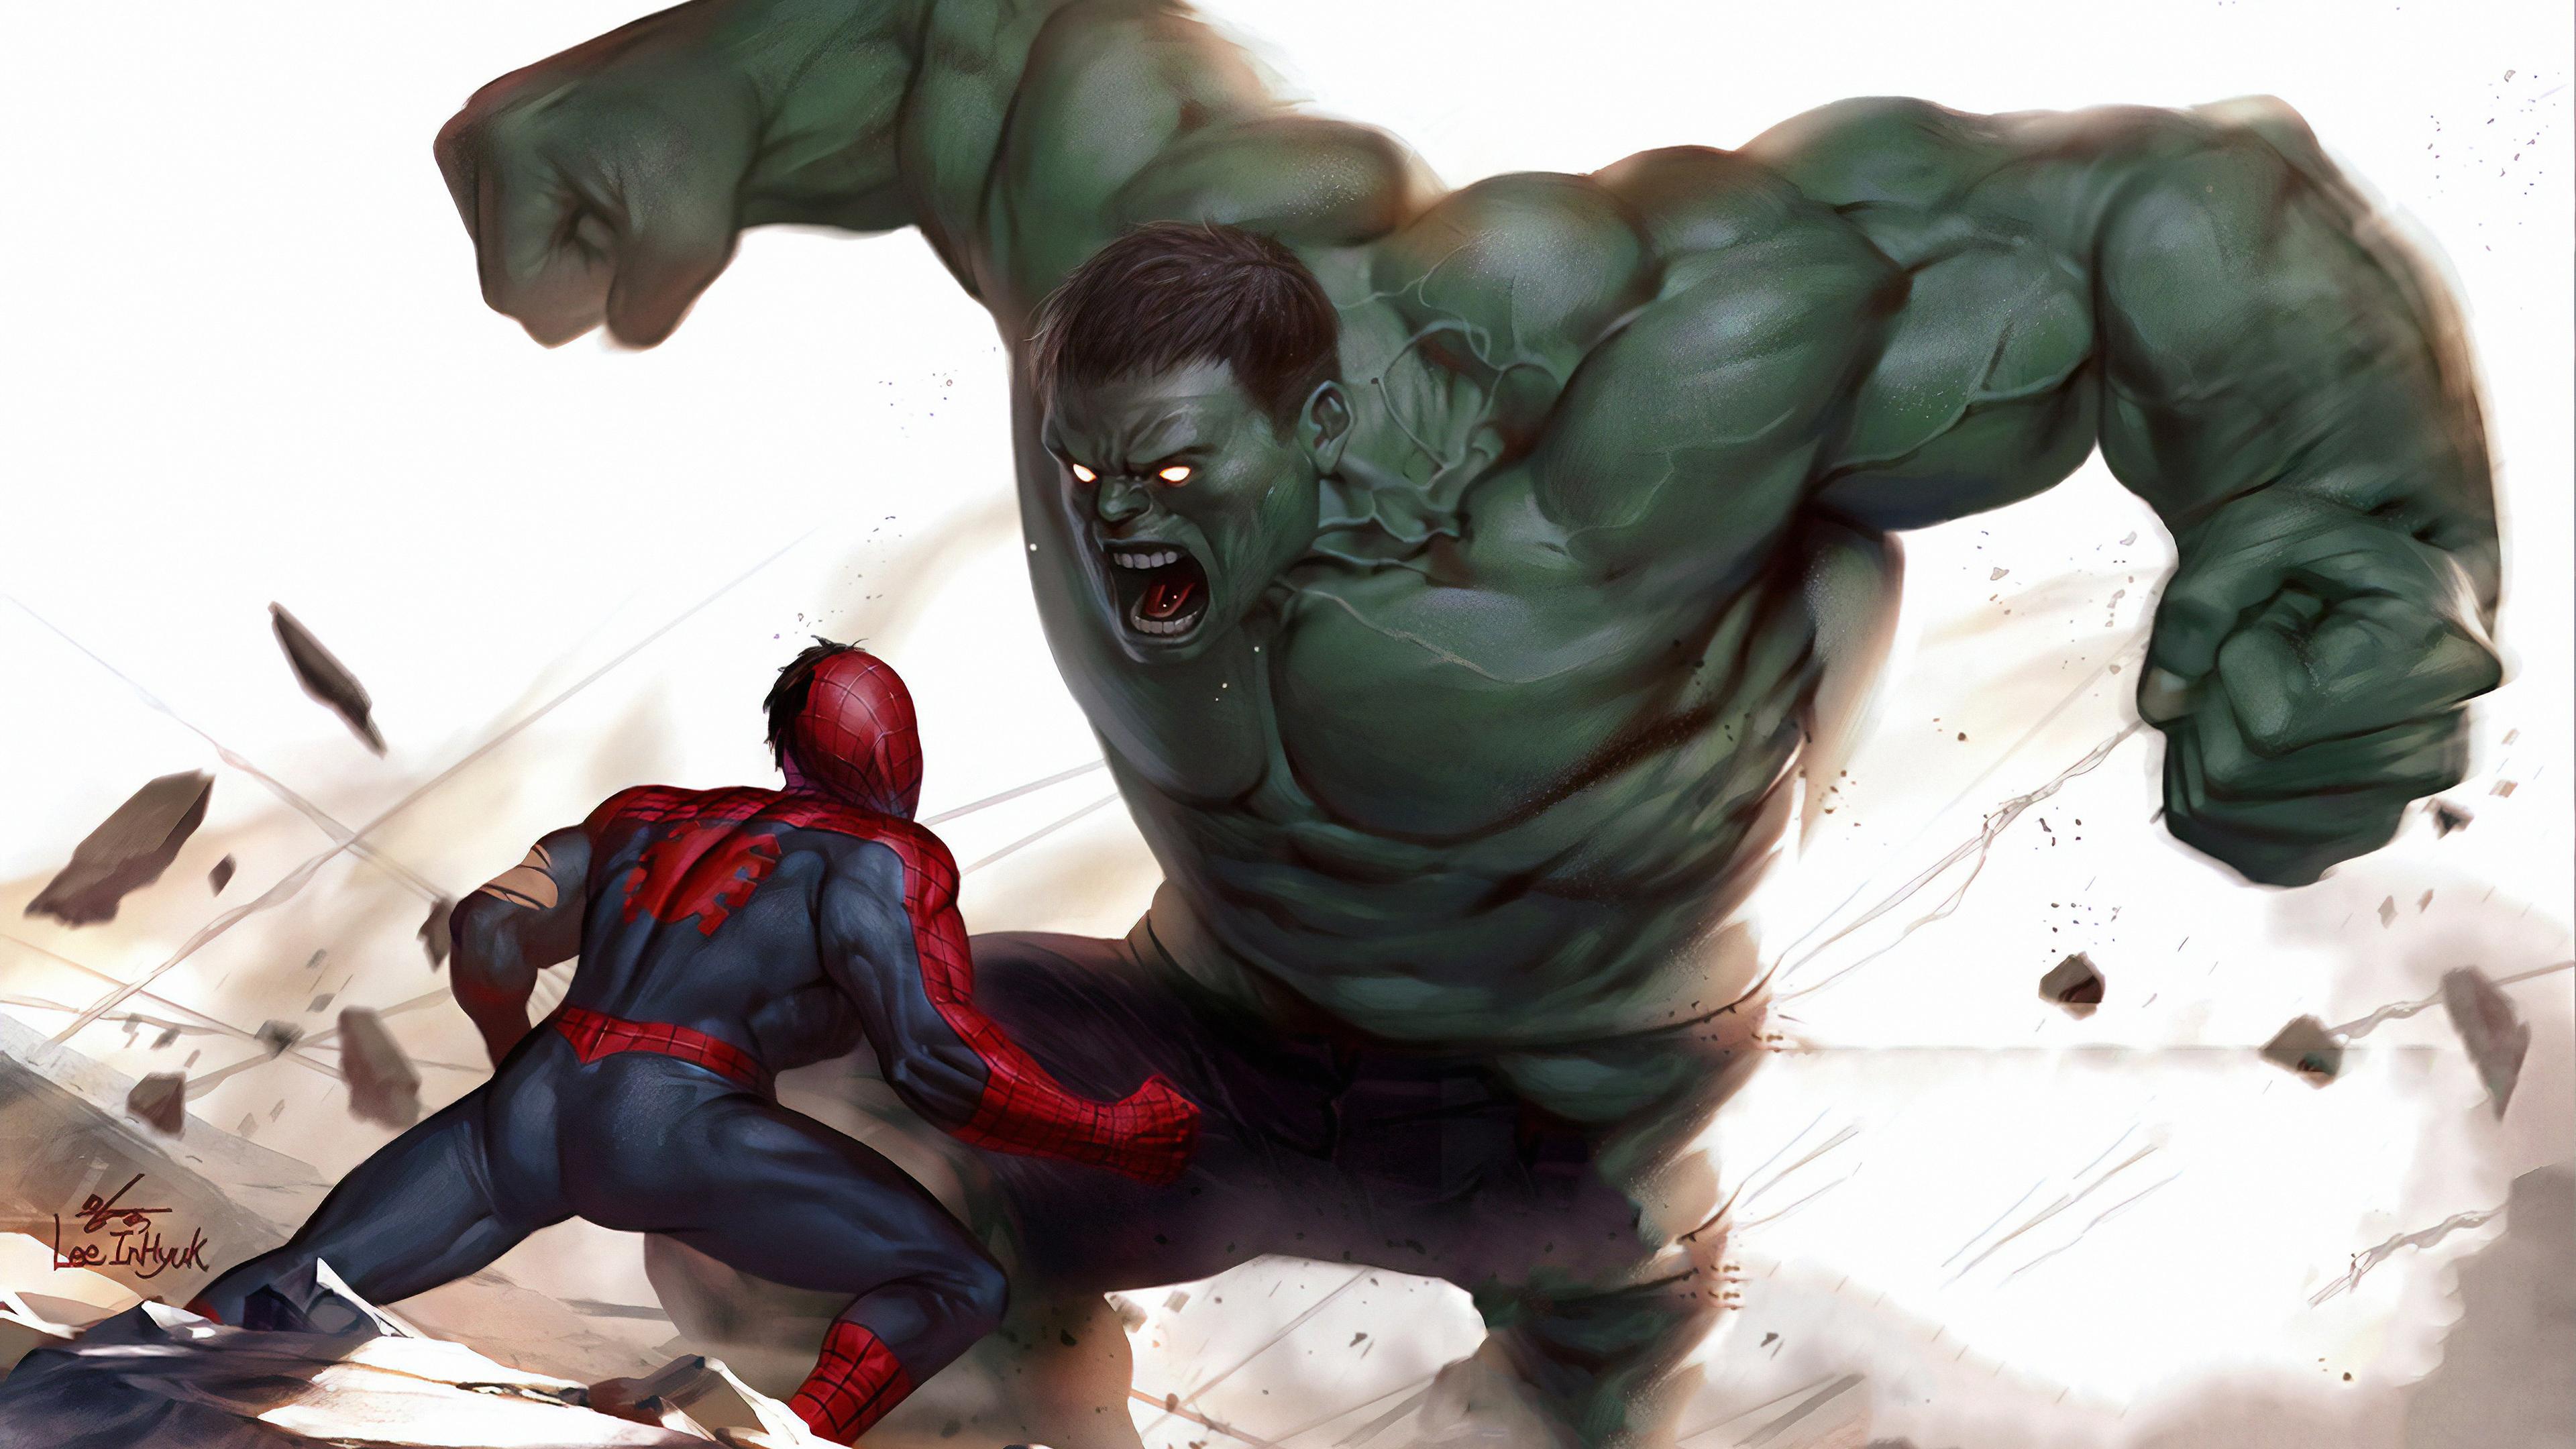 hulk vs spiderman art 1570394526 - Hulk Vs Spiderman Art - superheroes wallpapers, spiderman wallpapers, hulk wallpapers, hd-wallpapers, deviantart wallpapers, artwork wallpapers, 4k-wallpapers